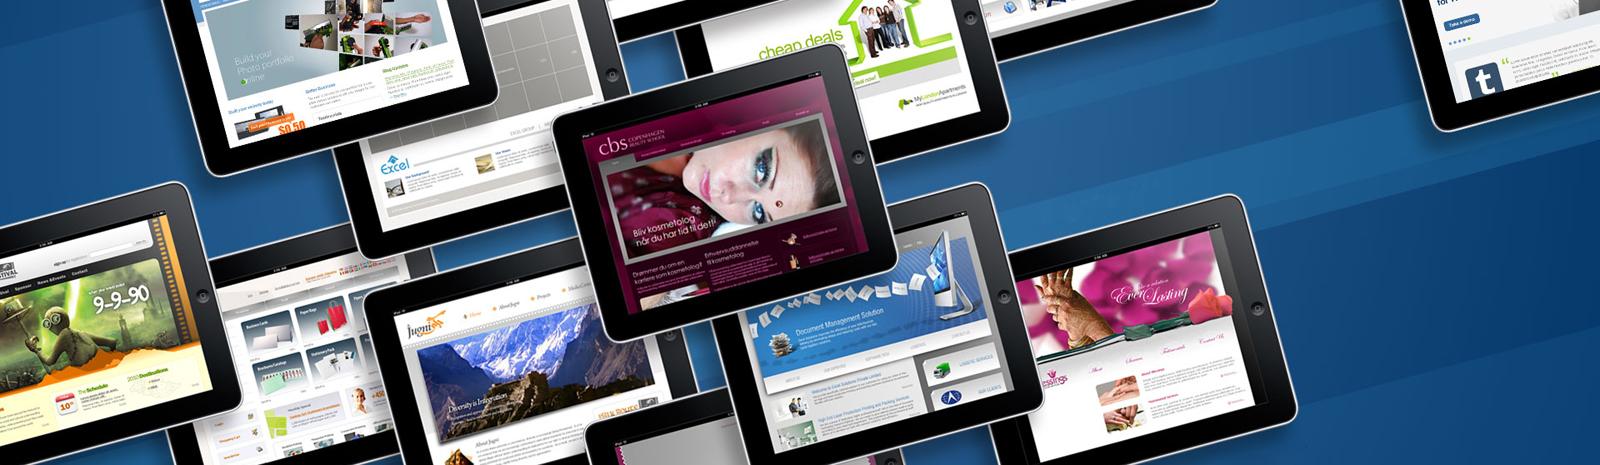 web-design-development-company-sri-lanka-designers-company-portfolio